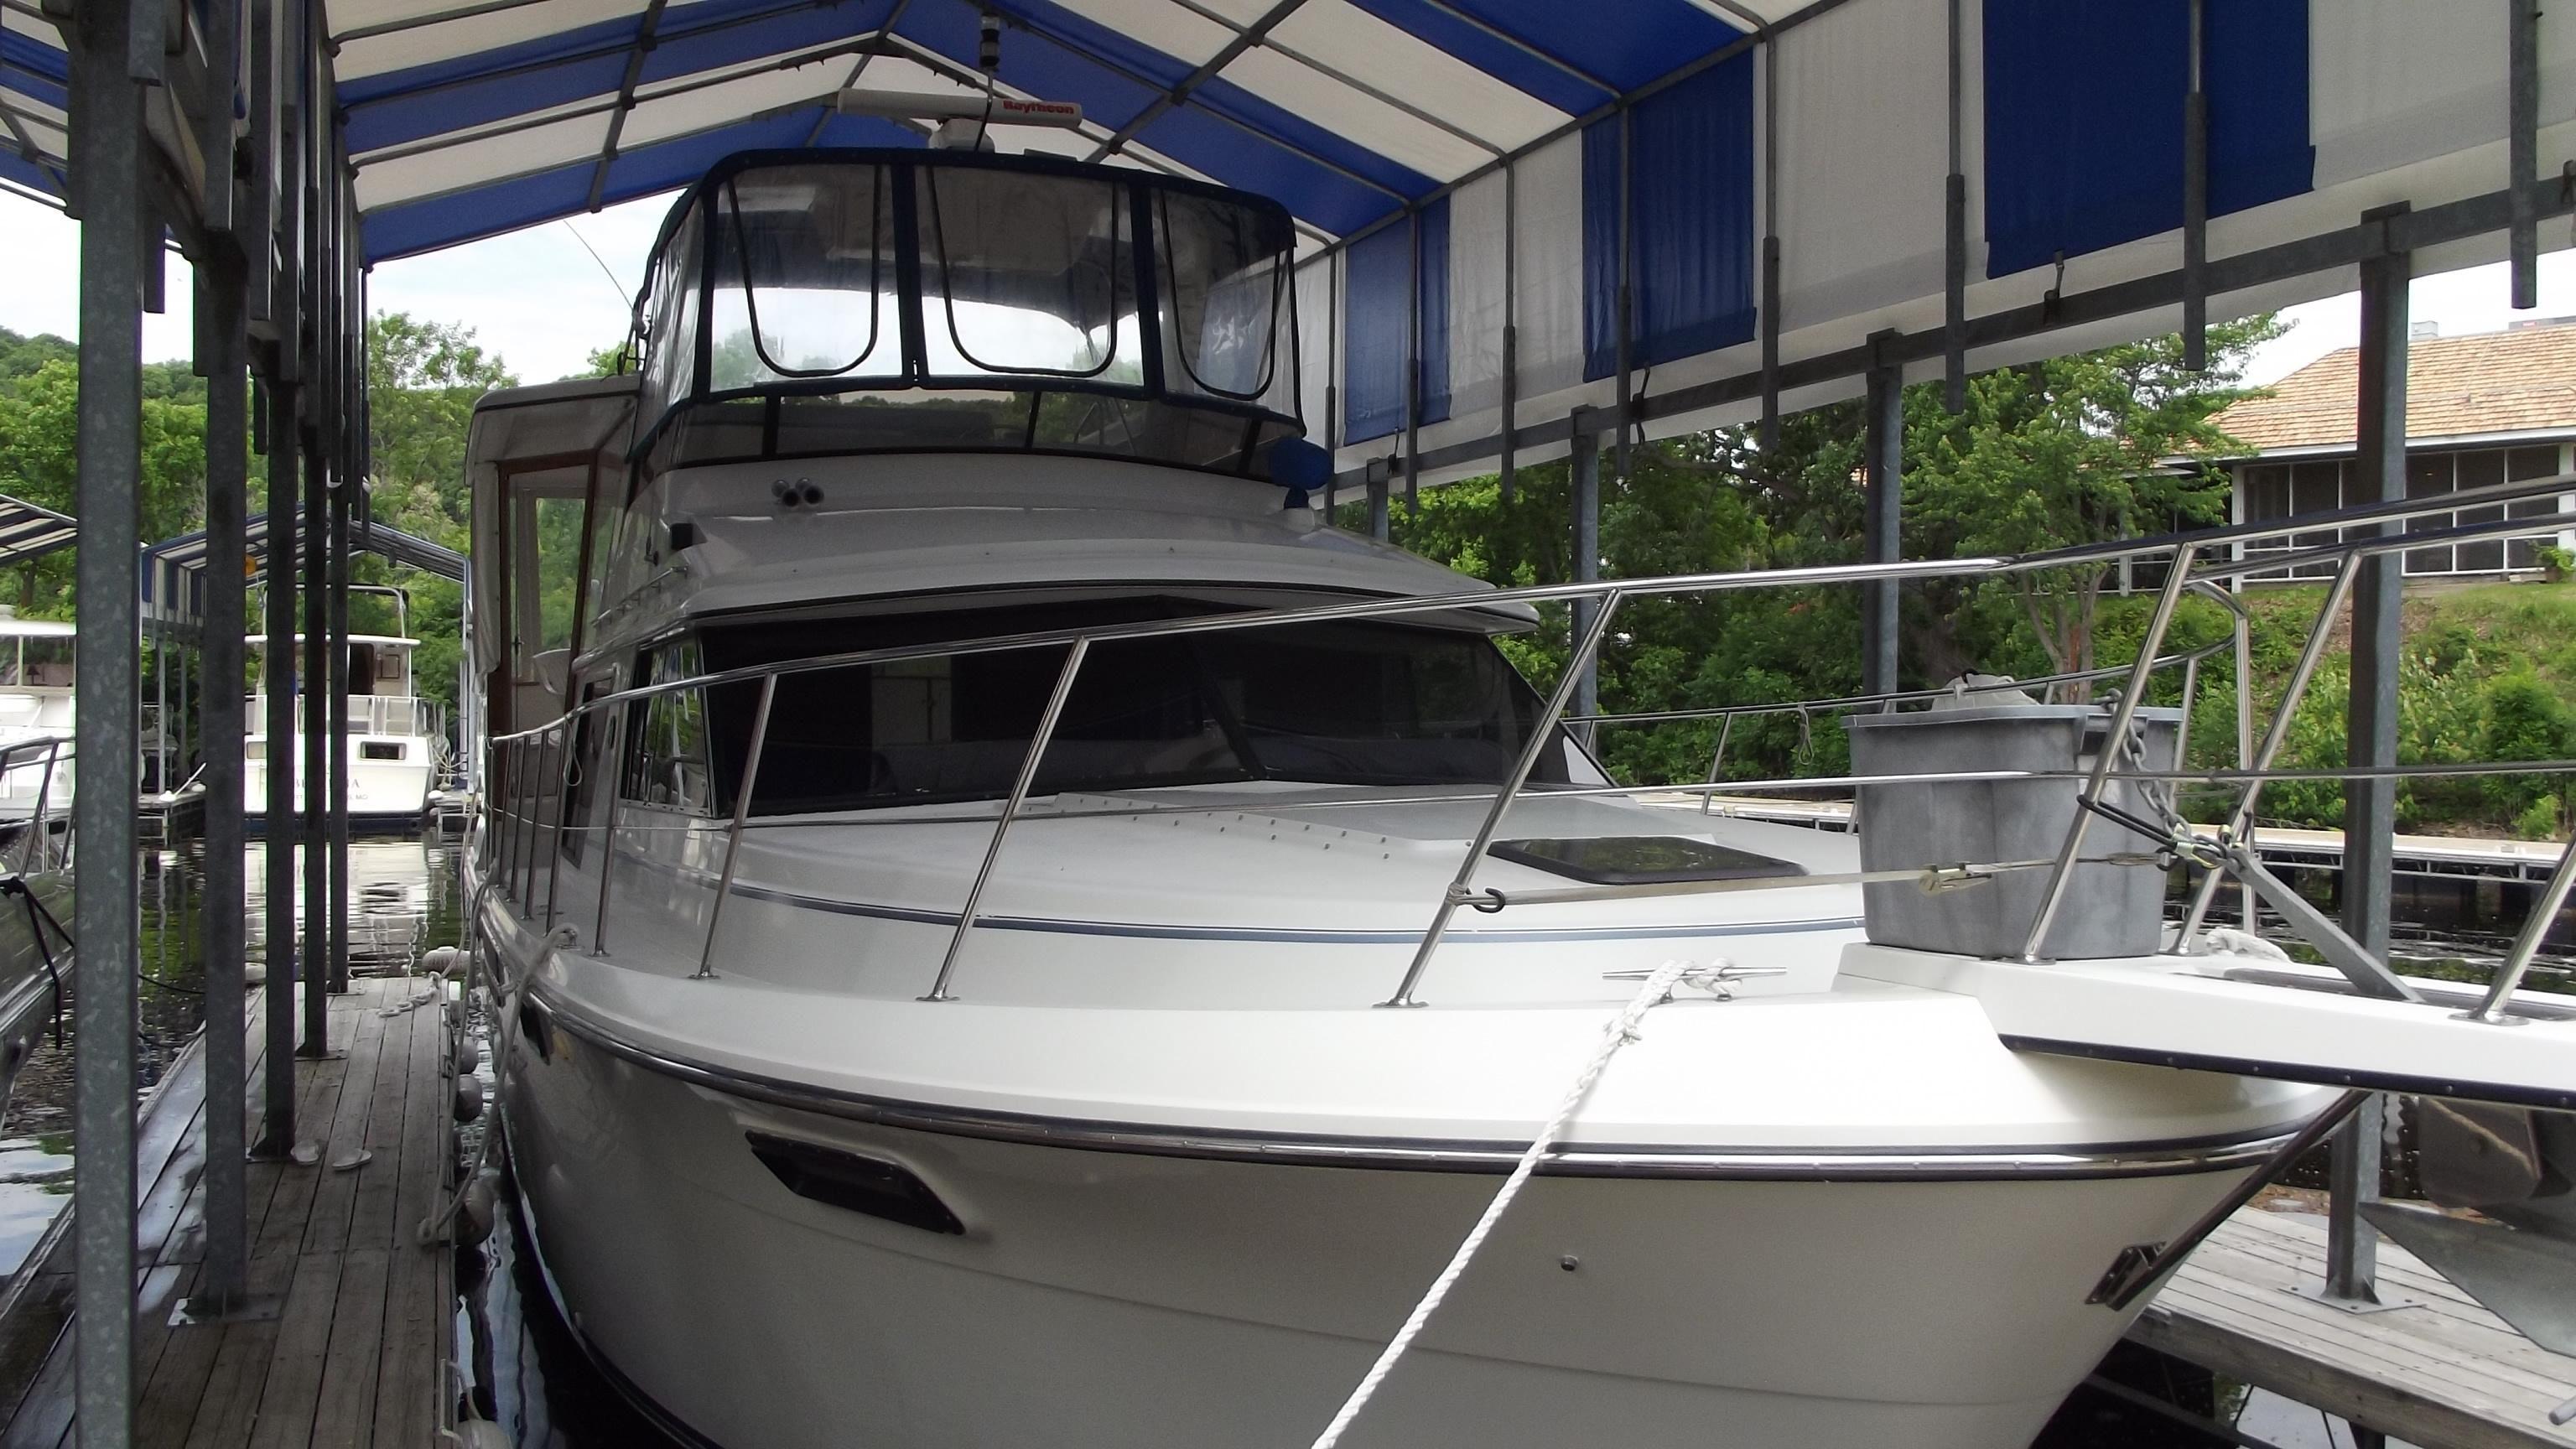 1991 carver 42 motor yacht power boat for sale www for Metro motor sales minneapolis mn